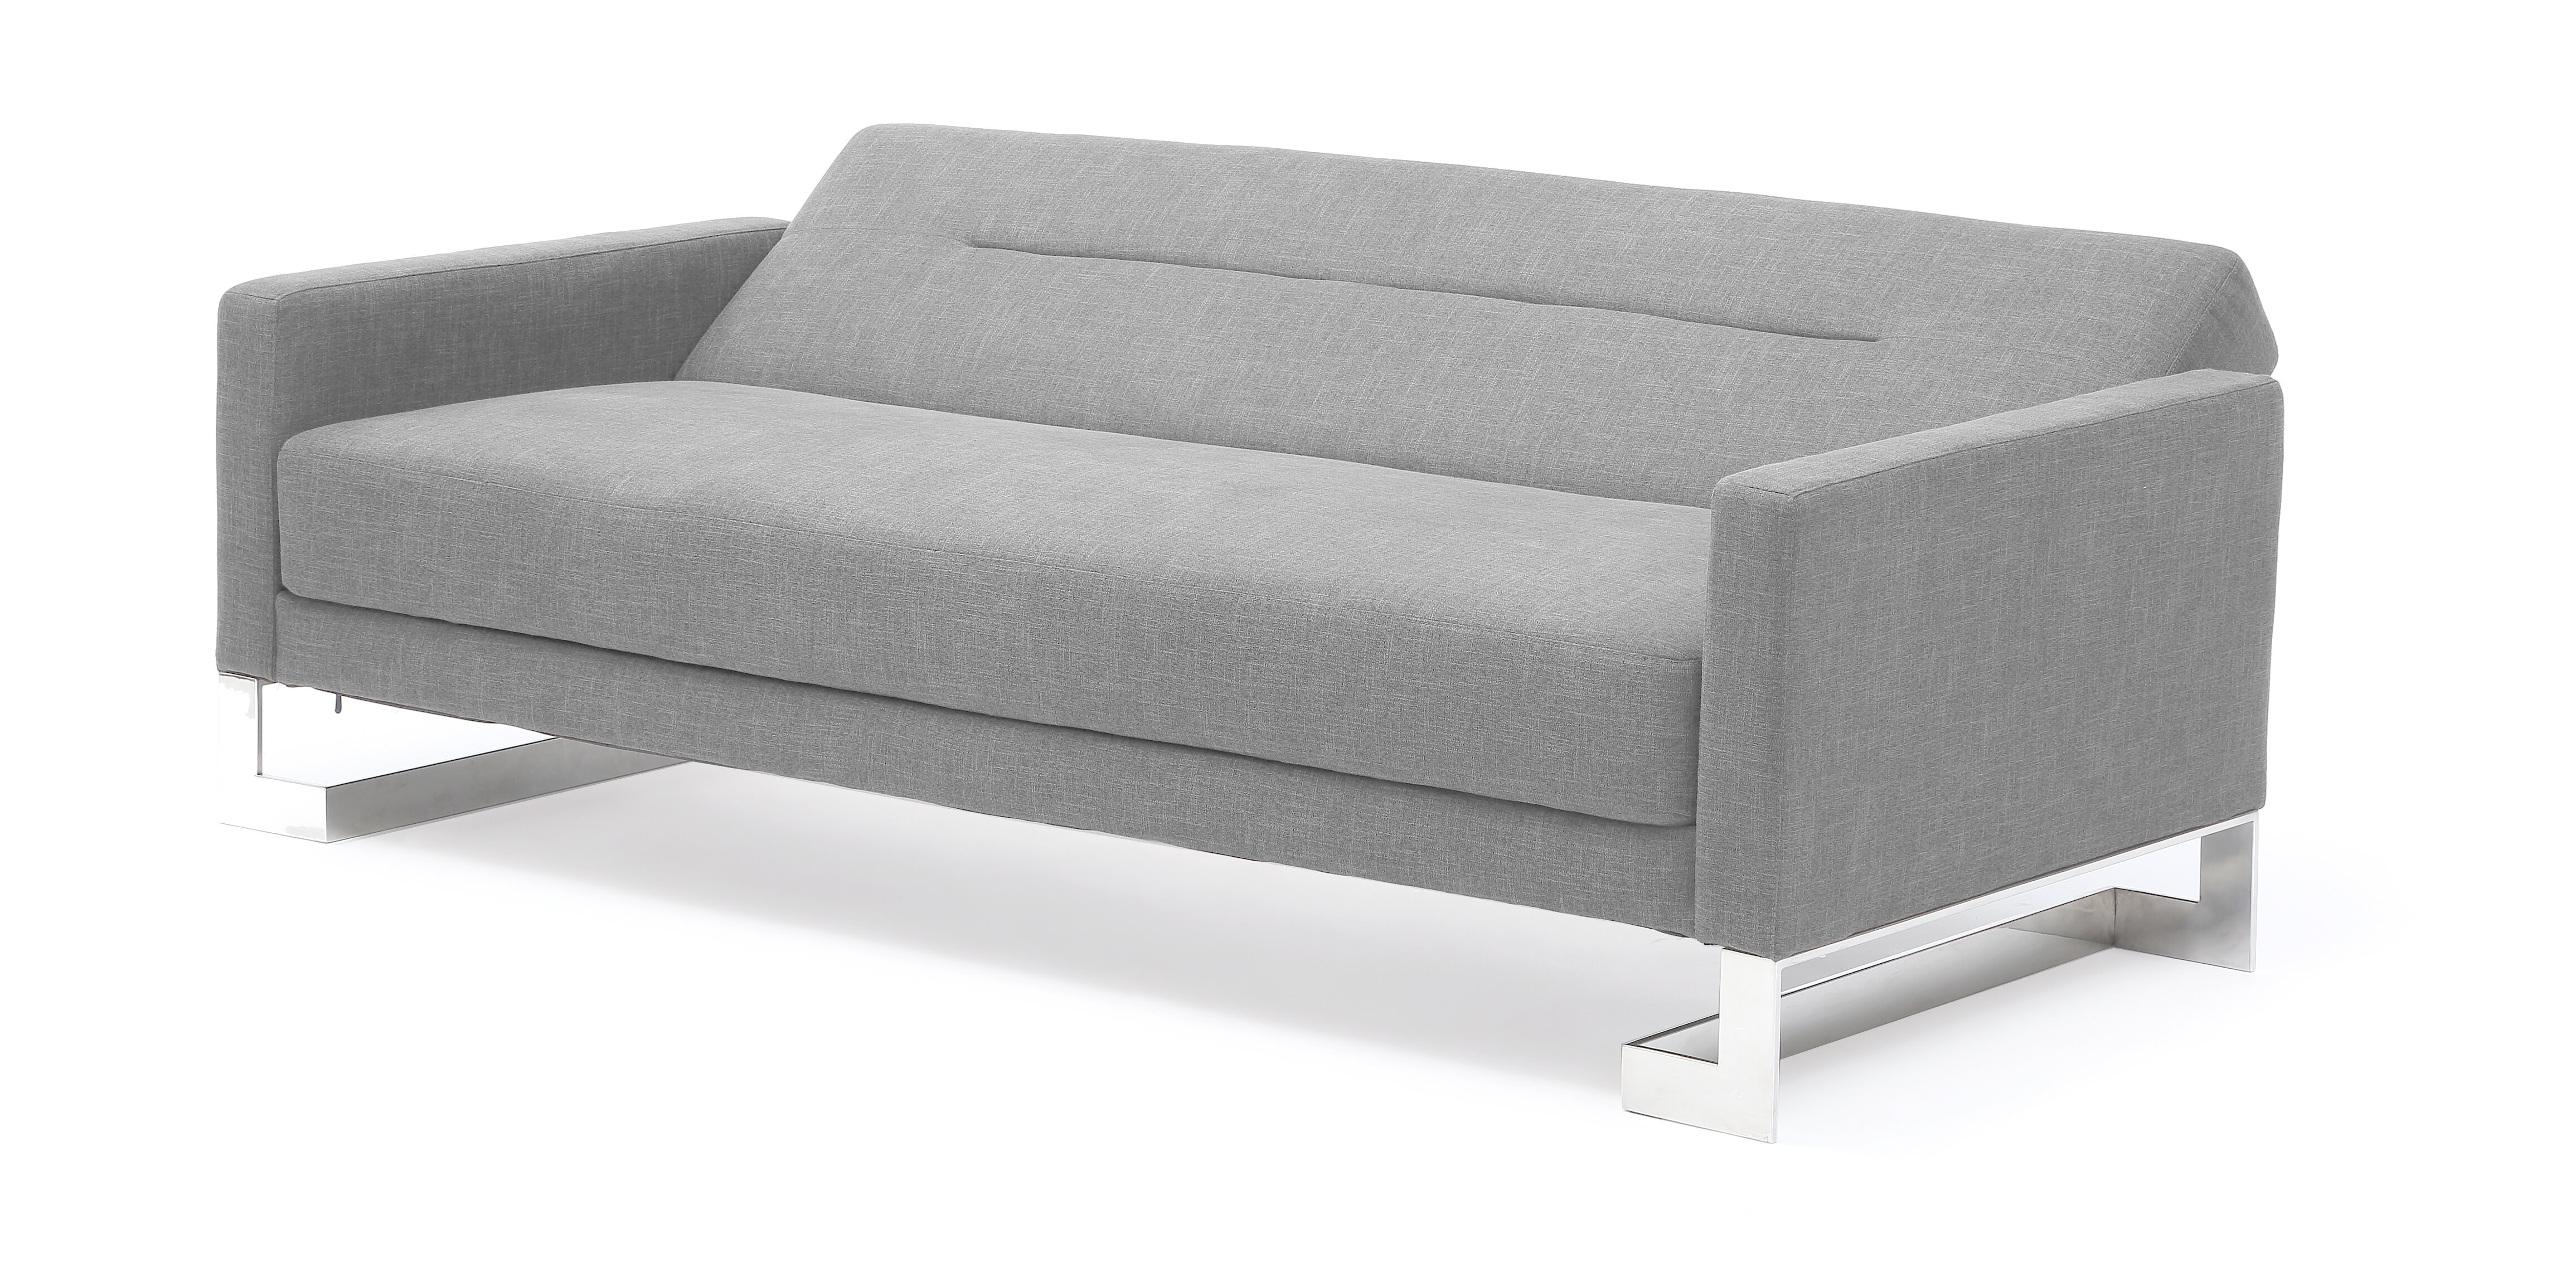 At Home USA Modern Sleeper Sofa & Reviews | Wayfair